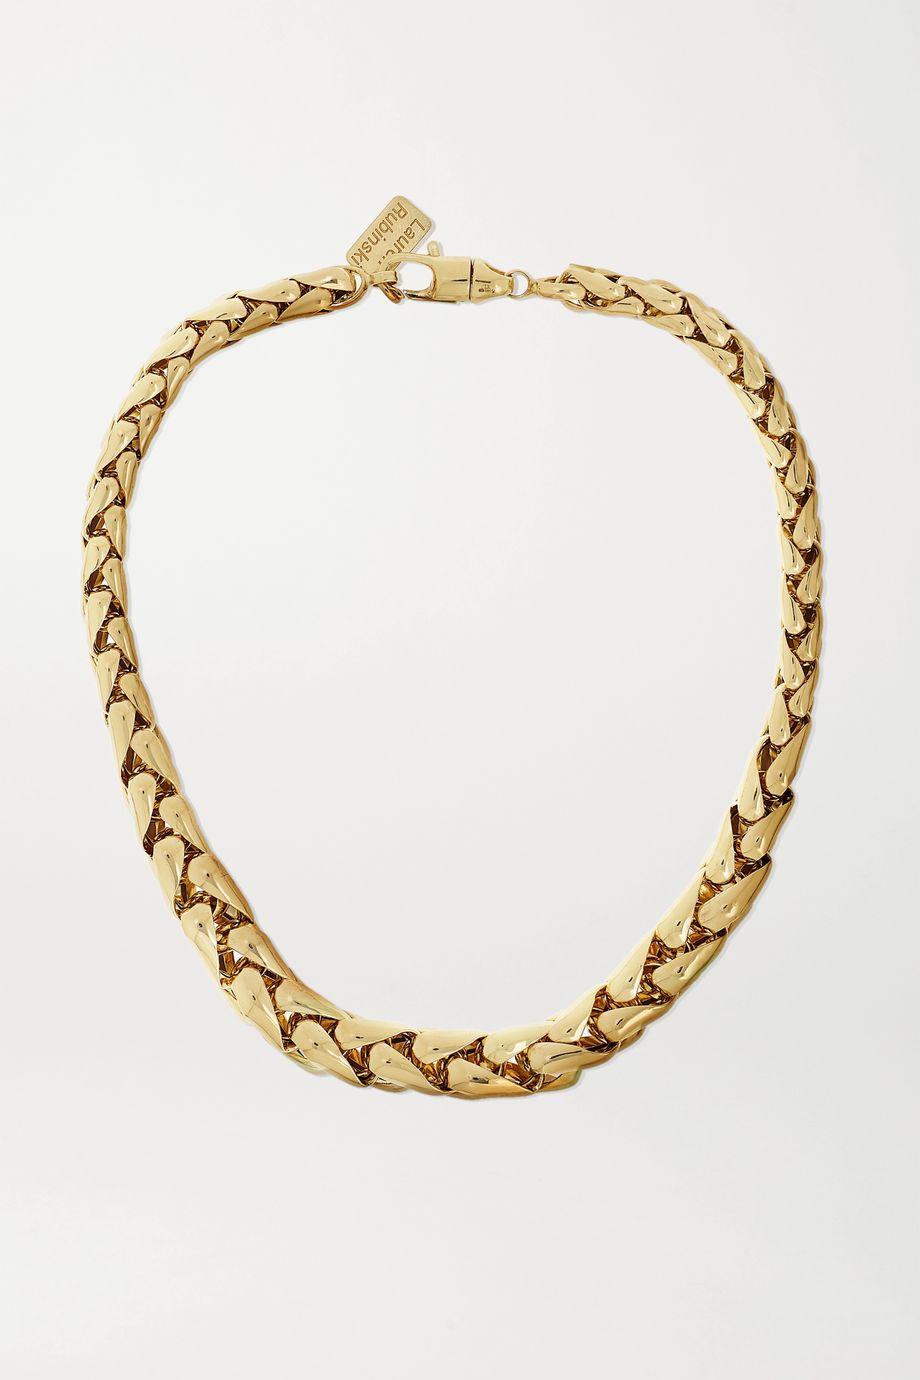 Lauren Rubinski Small 14-karat gold necklace